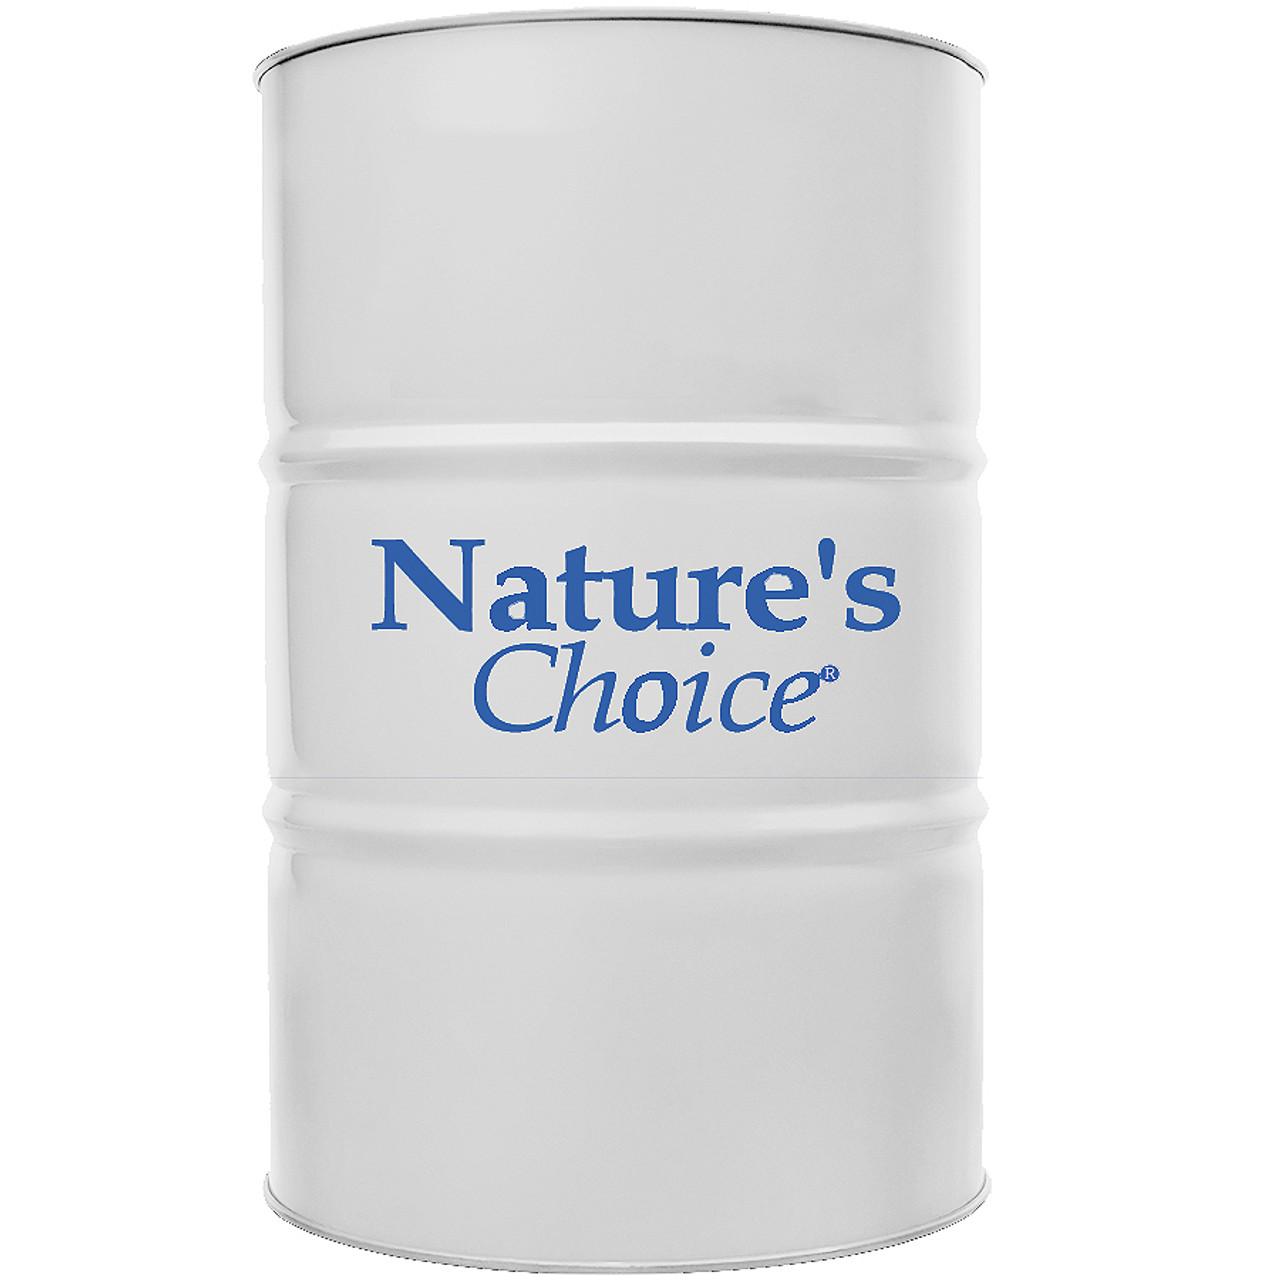 Nature's Choice SynBlend SN PLUS/GF-5 5W-30